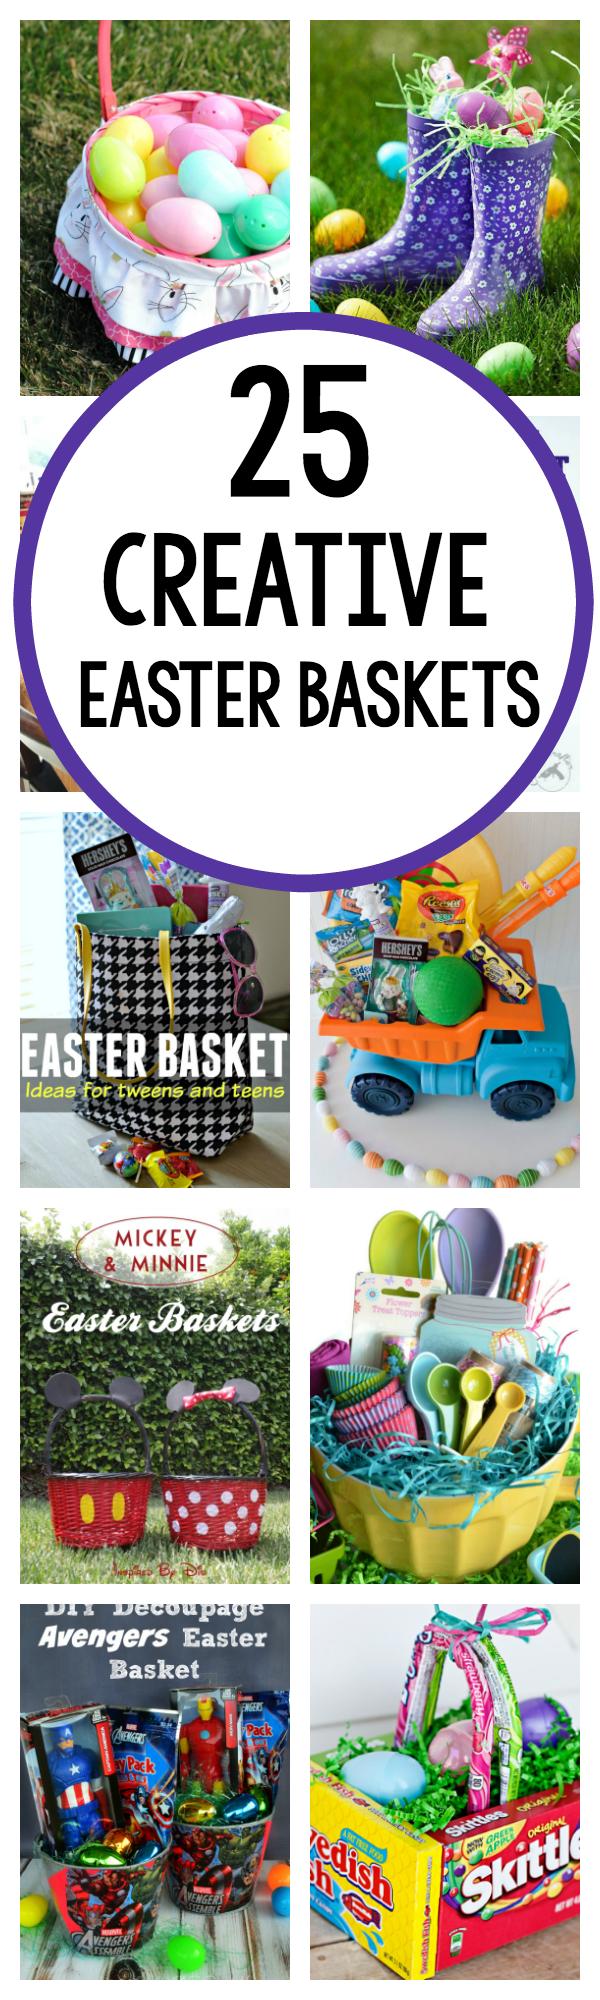 25 Creative Easter Basket Ideas